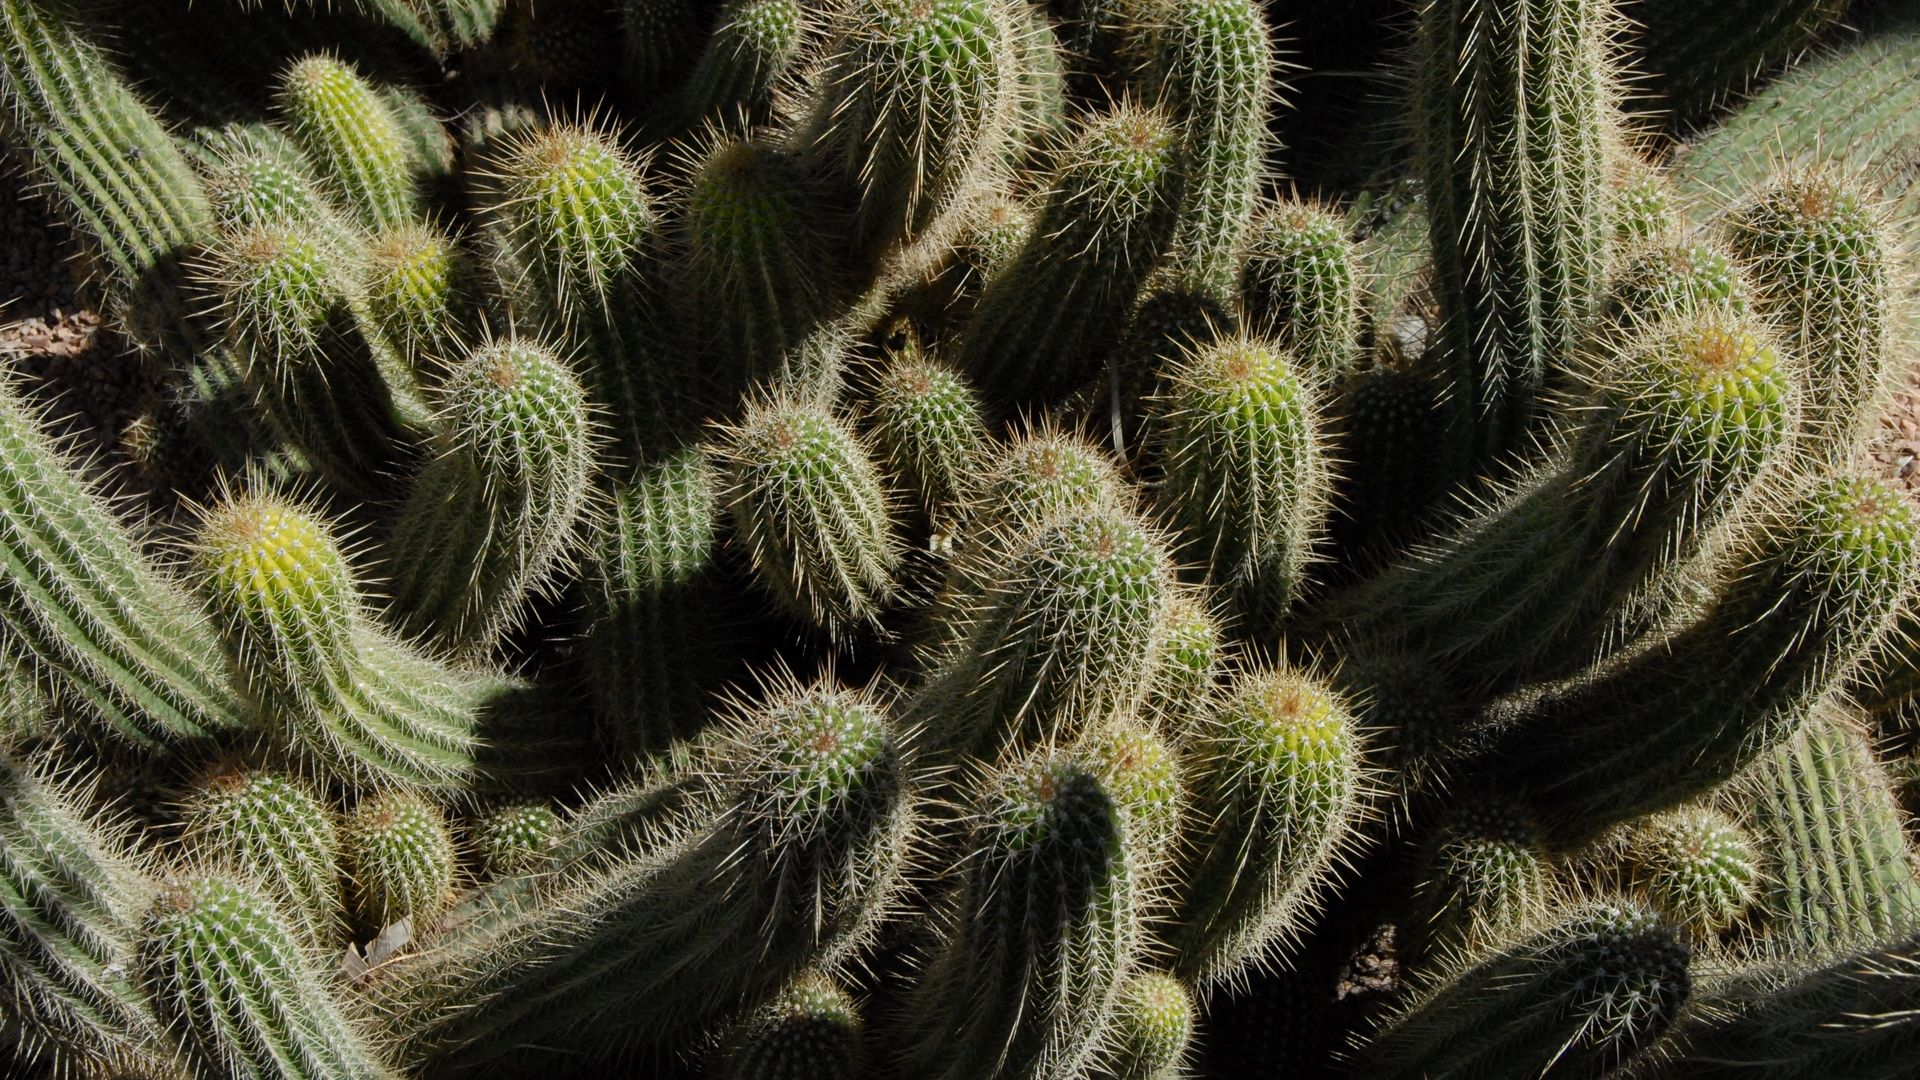 Cactus wallpaper photo